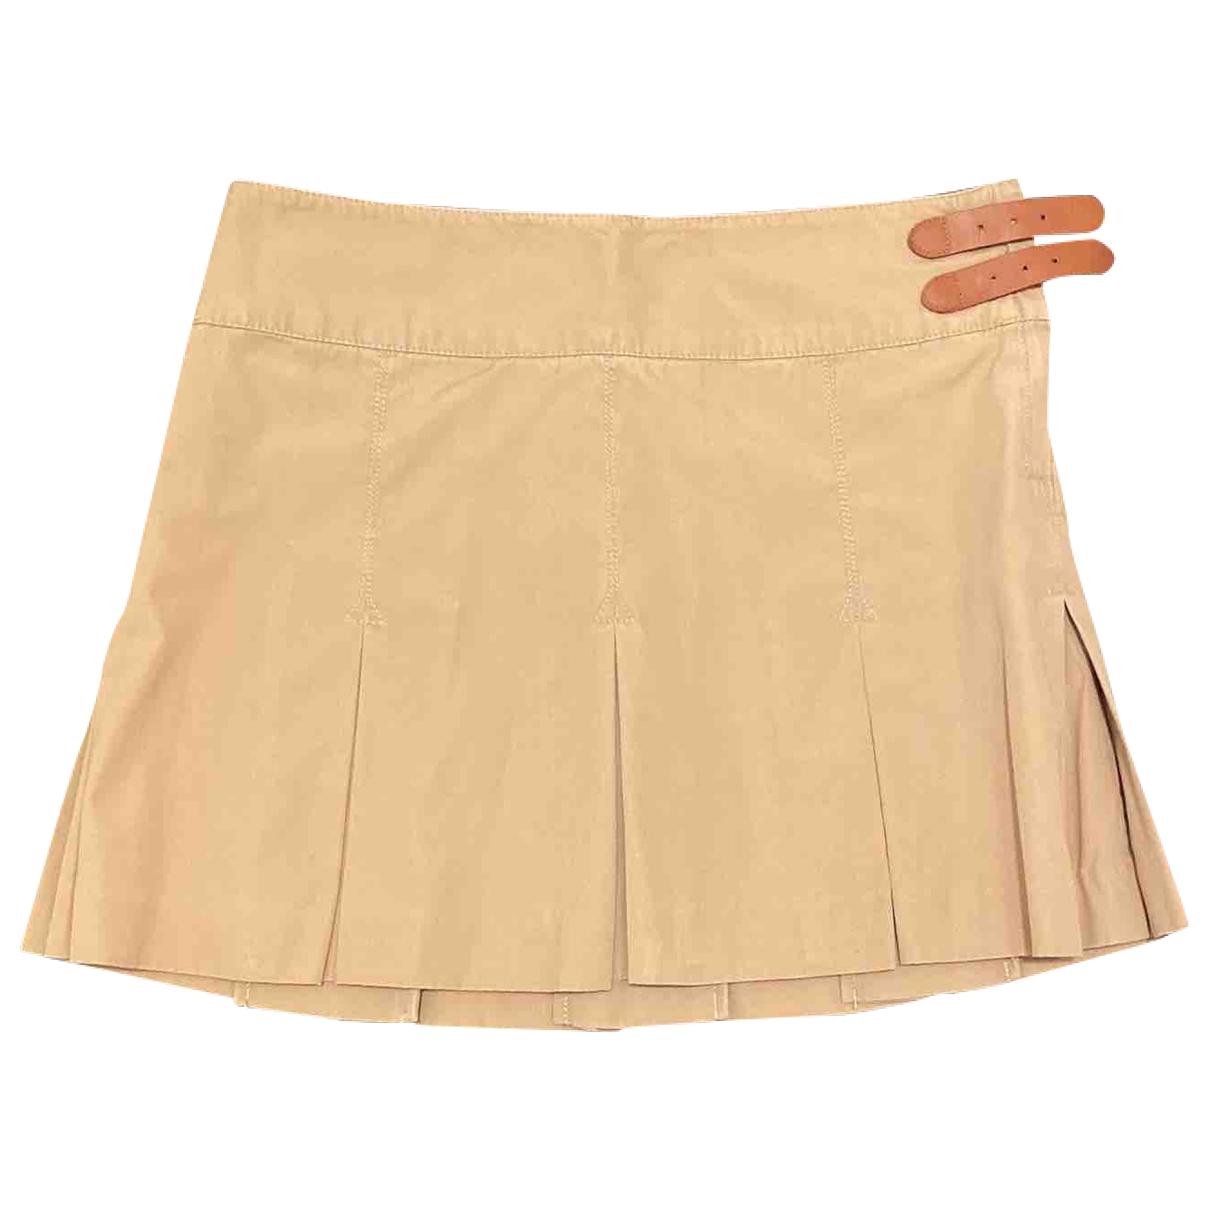 Polo Ralph Lauren \N Beige Cotton skirt for Women 2 US